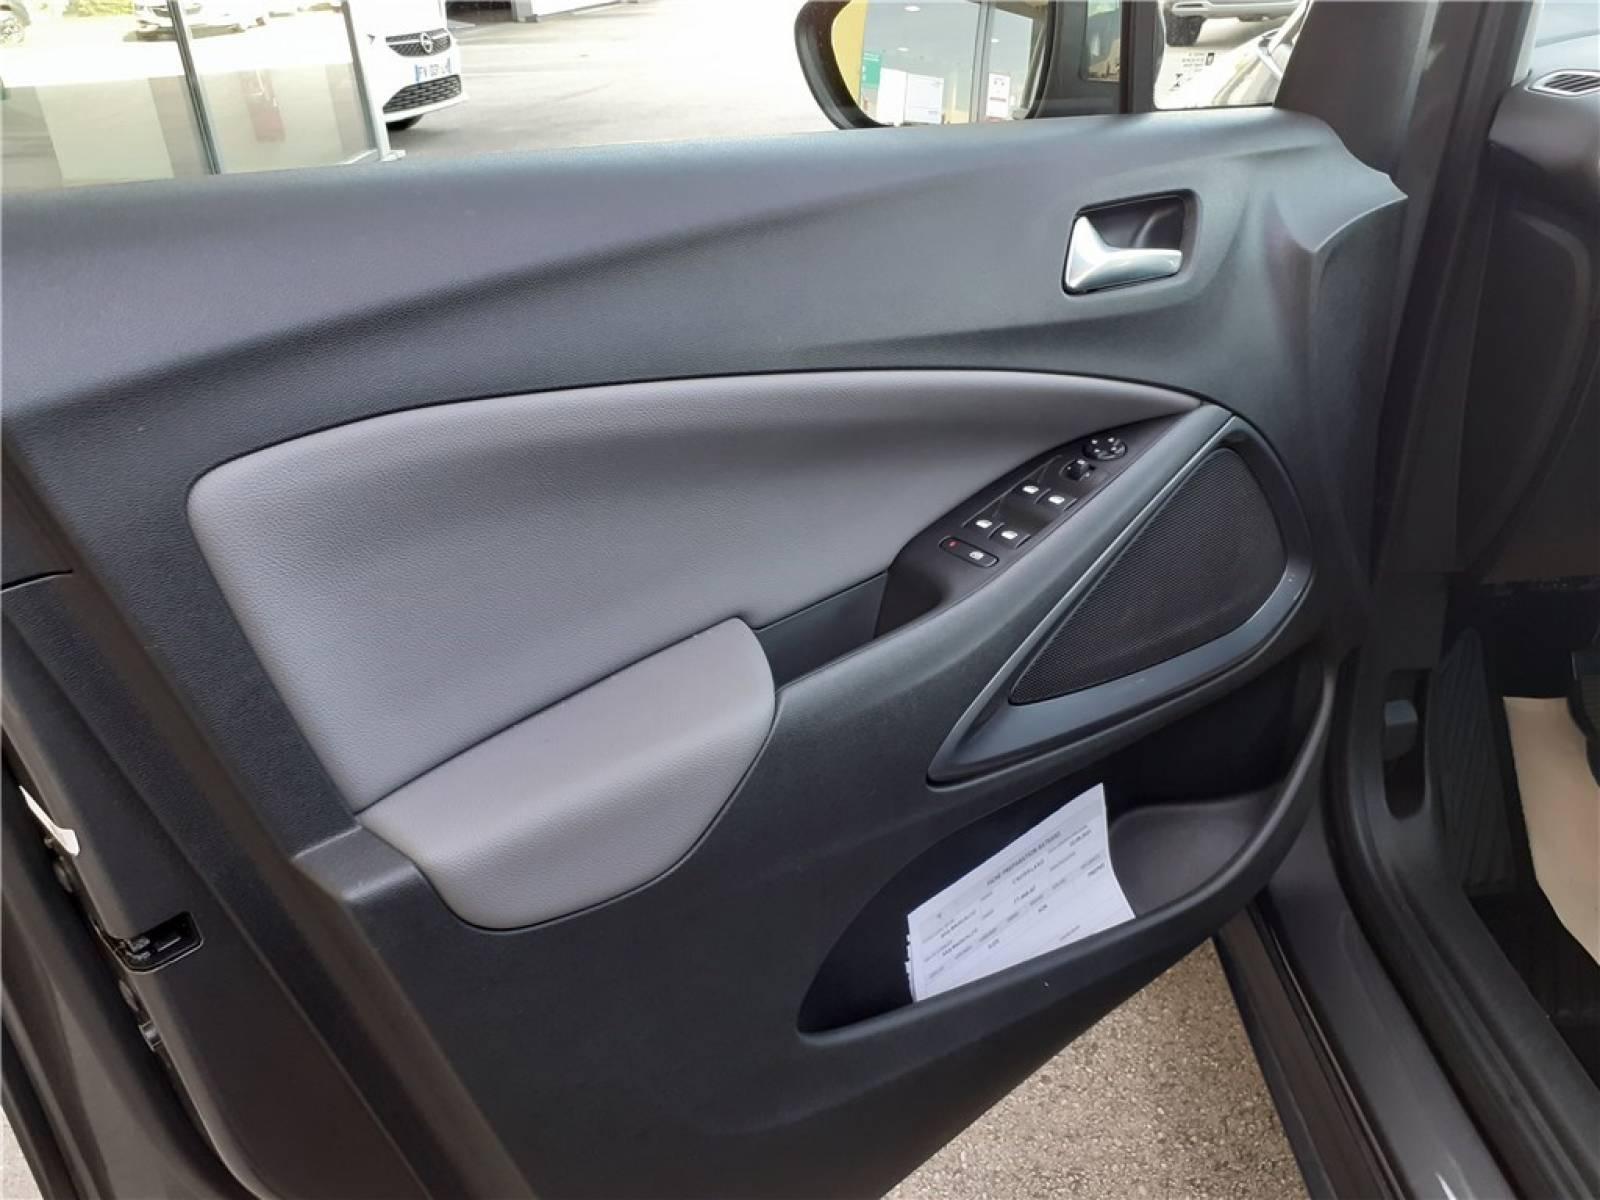 OPEL Crossland X 1.2 Turbo 110 ch - véhicule d'occasion - Groupe Guillet - Opel Magicauto - Chalon-sur-Saône - 71380 - Saint-Marcel - 12